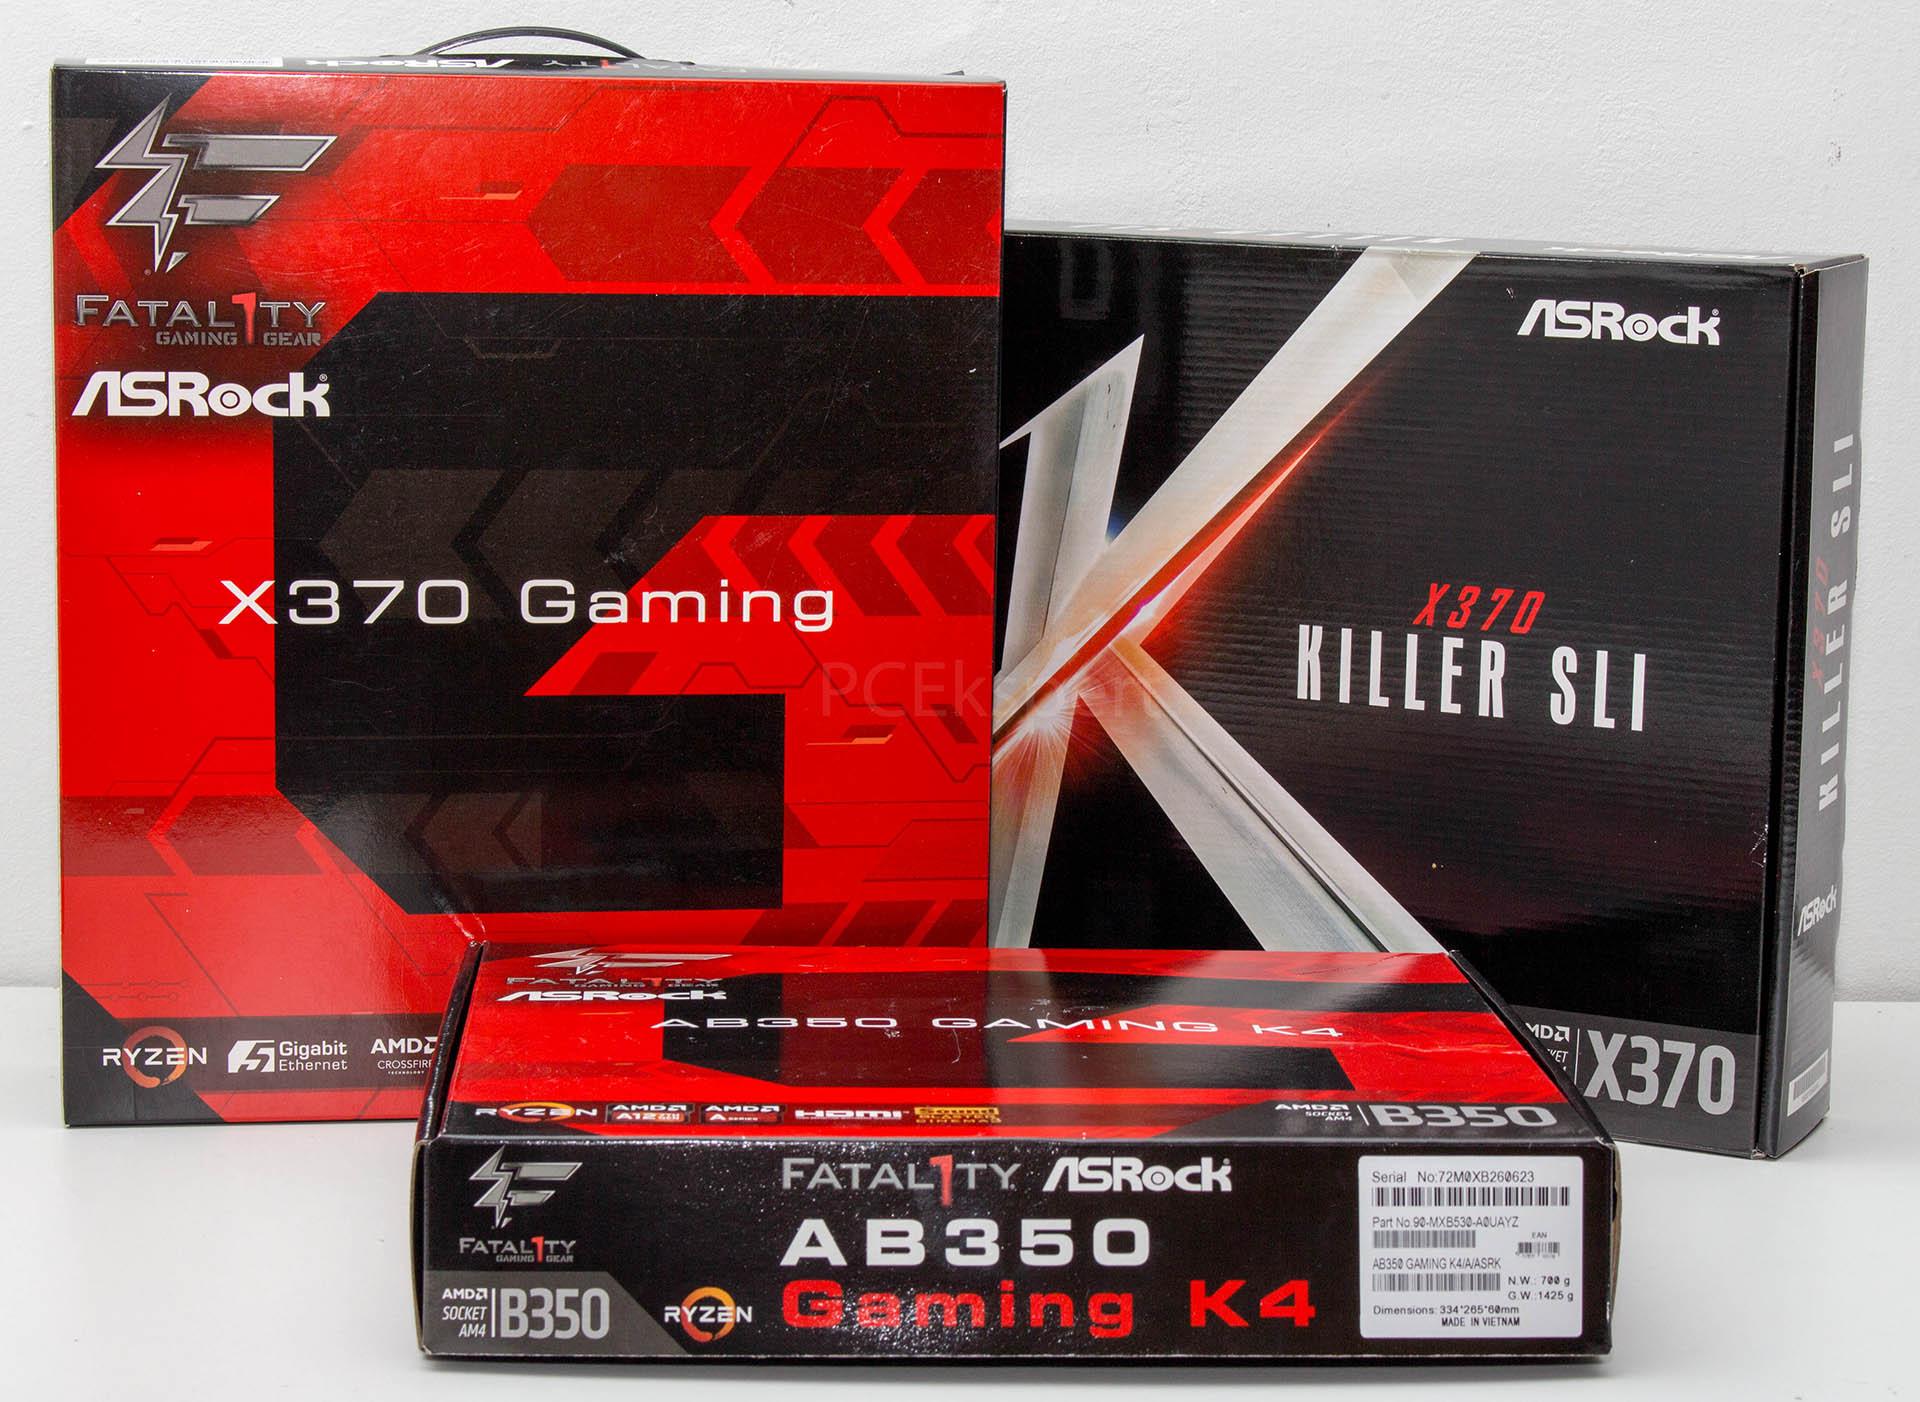 ASRock Fatal1ty X370 Gaming, X370 Killer SLI & Fatal1ty AB350 Gaming K4 recenzija